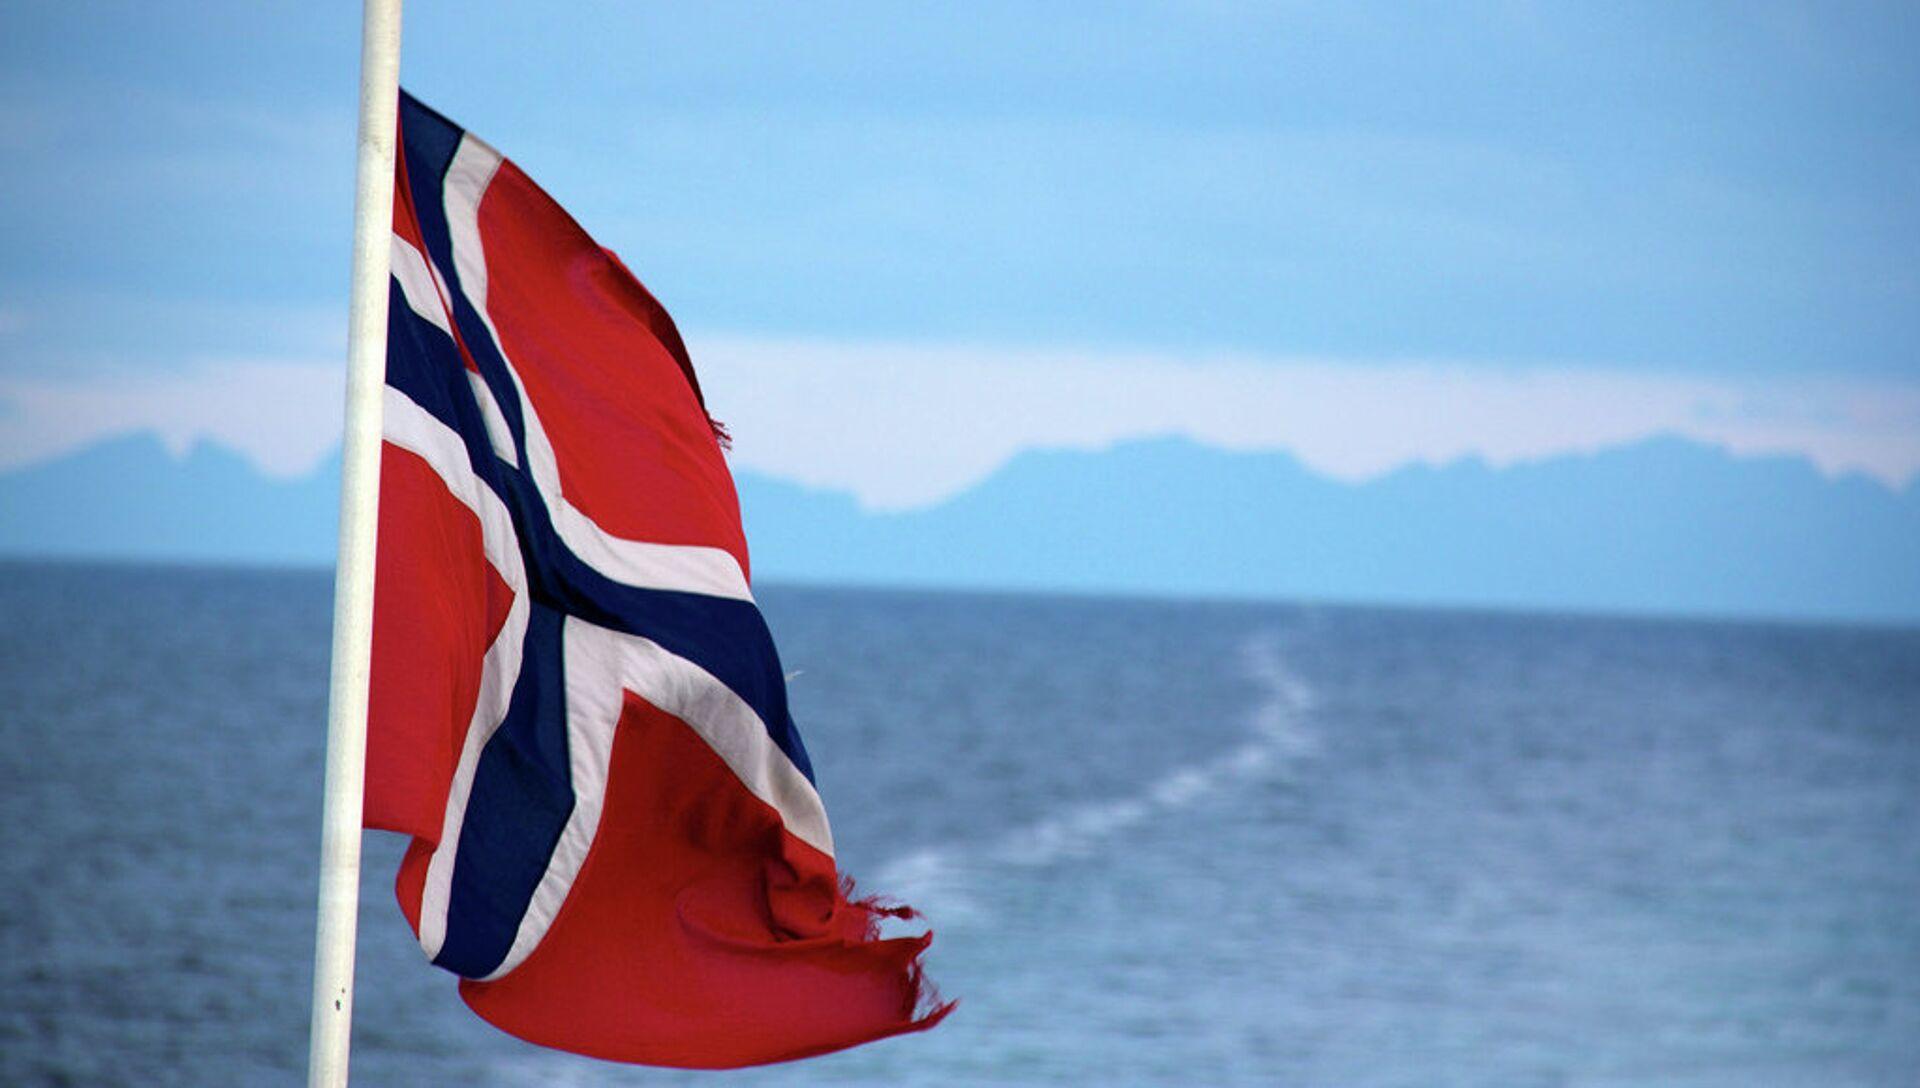 Flag of Norway - Sputnik Italia, 1920, 28.04.2021